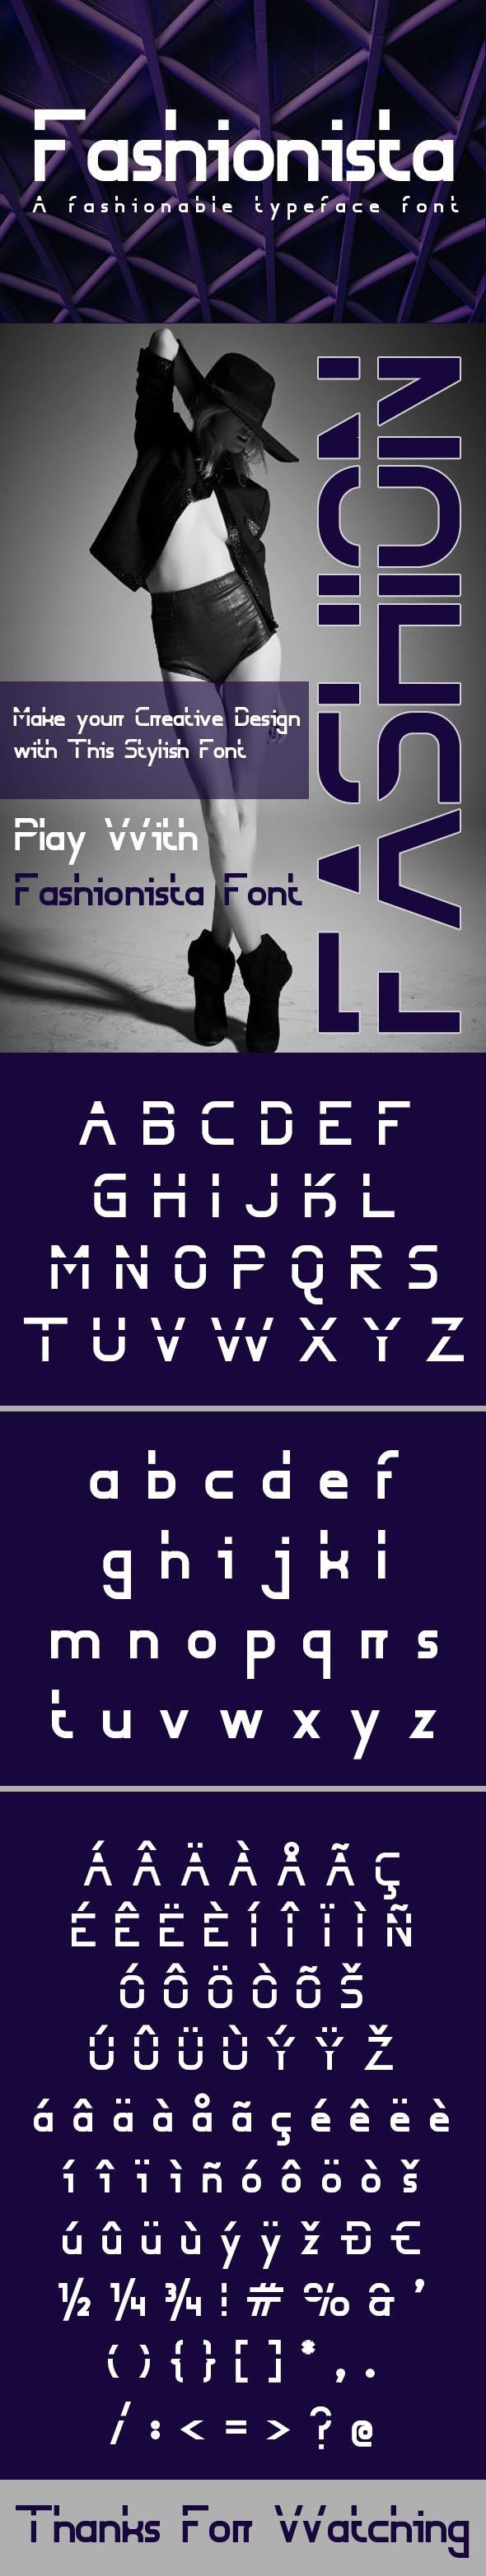 Fashionista Font - Sans-Serif Fonts